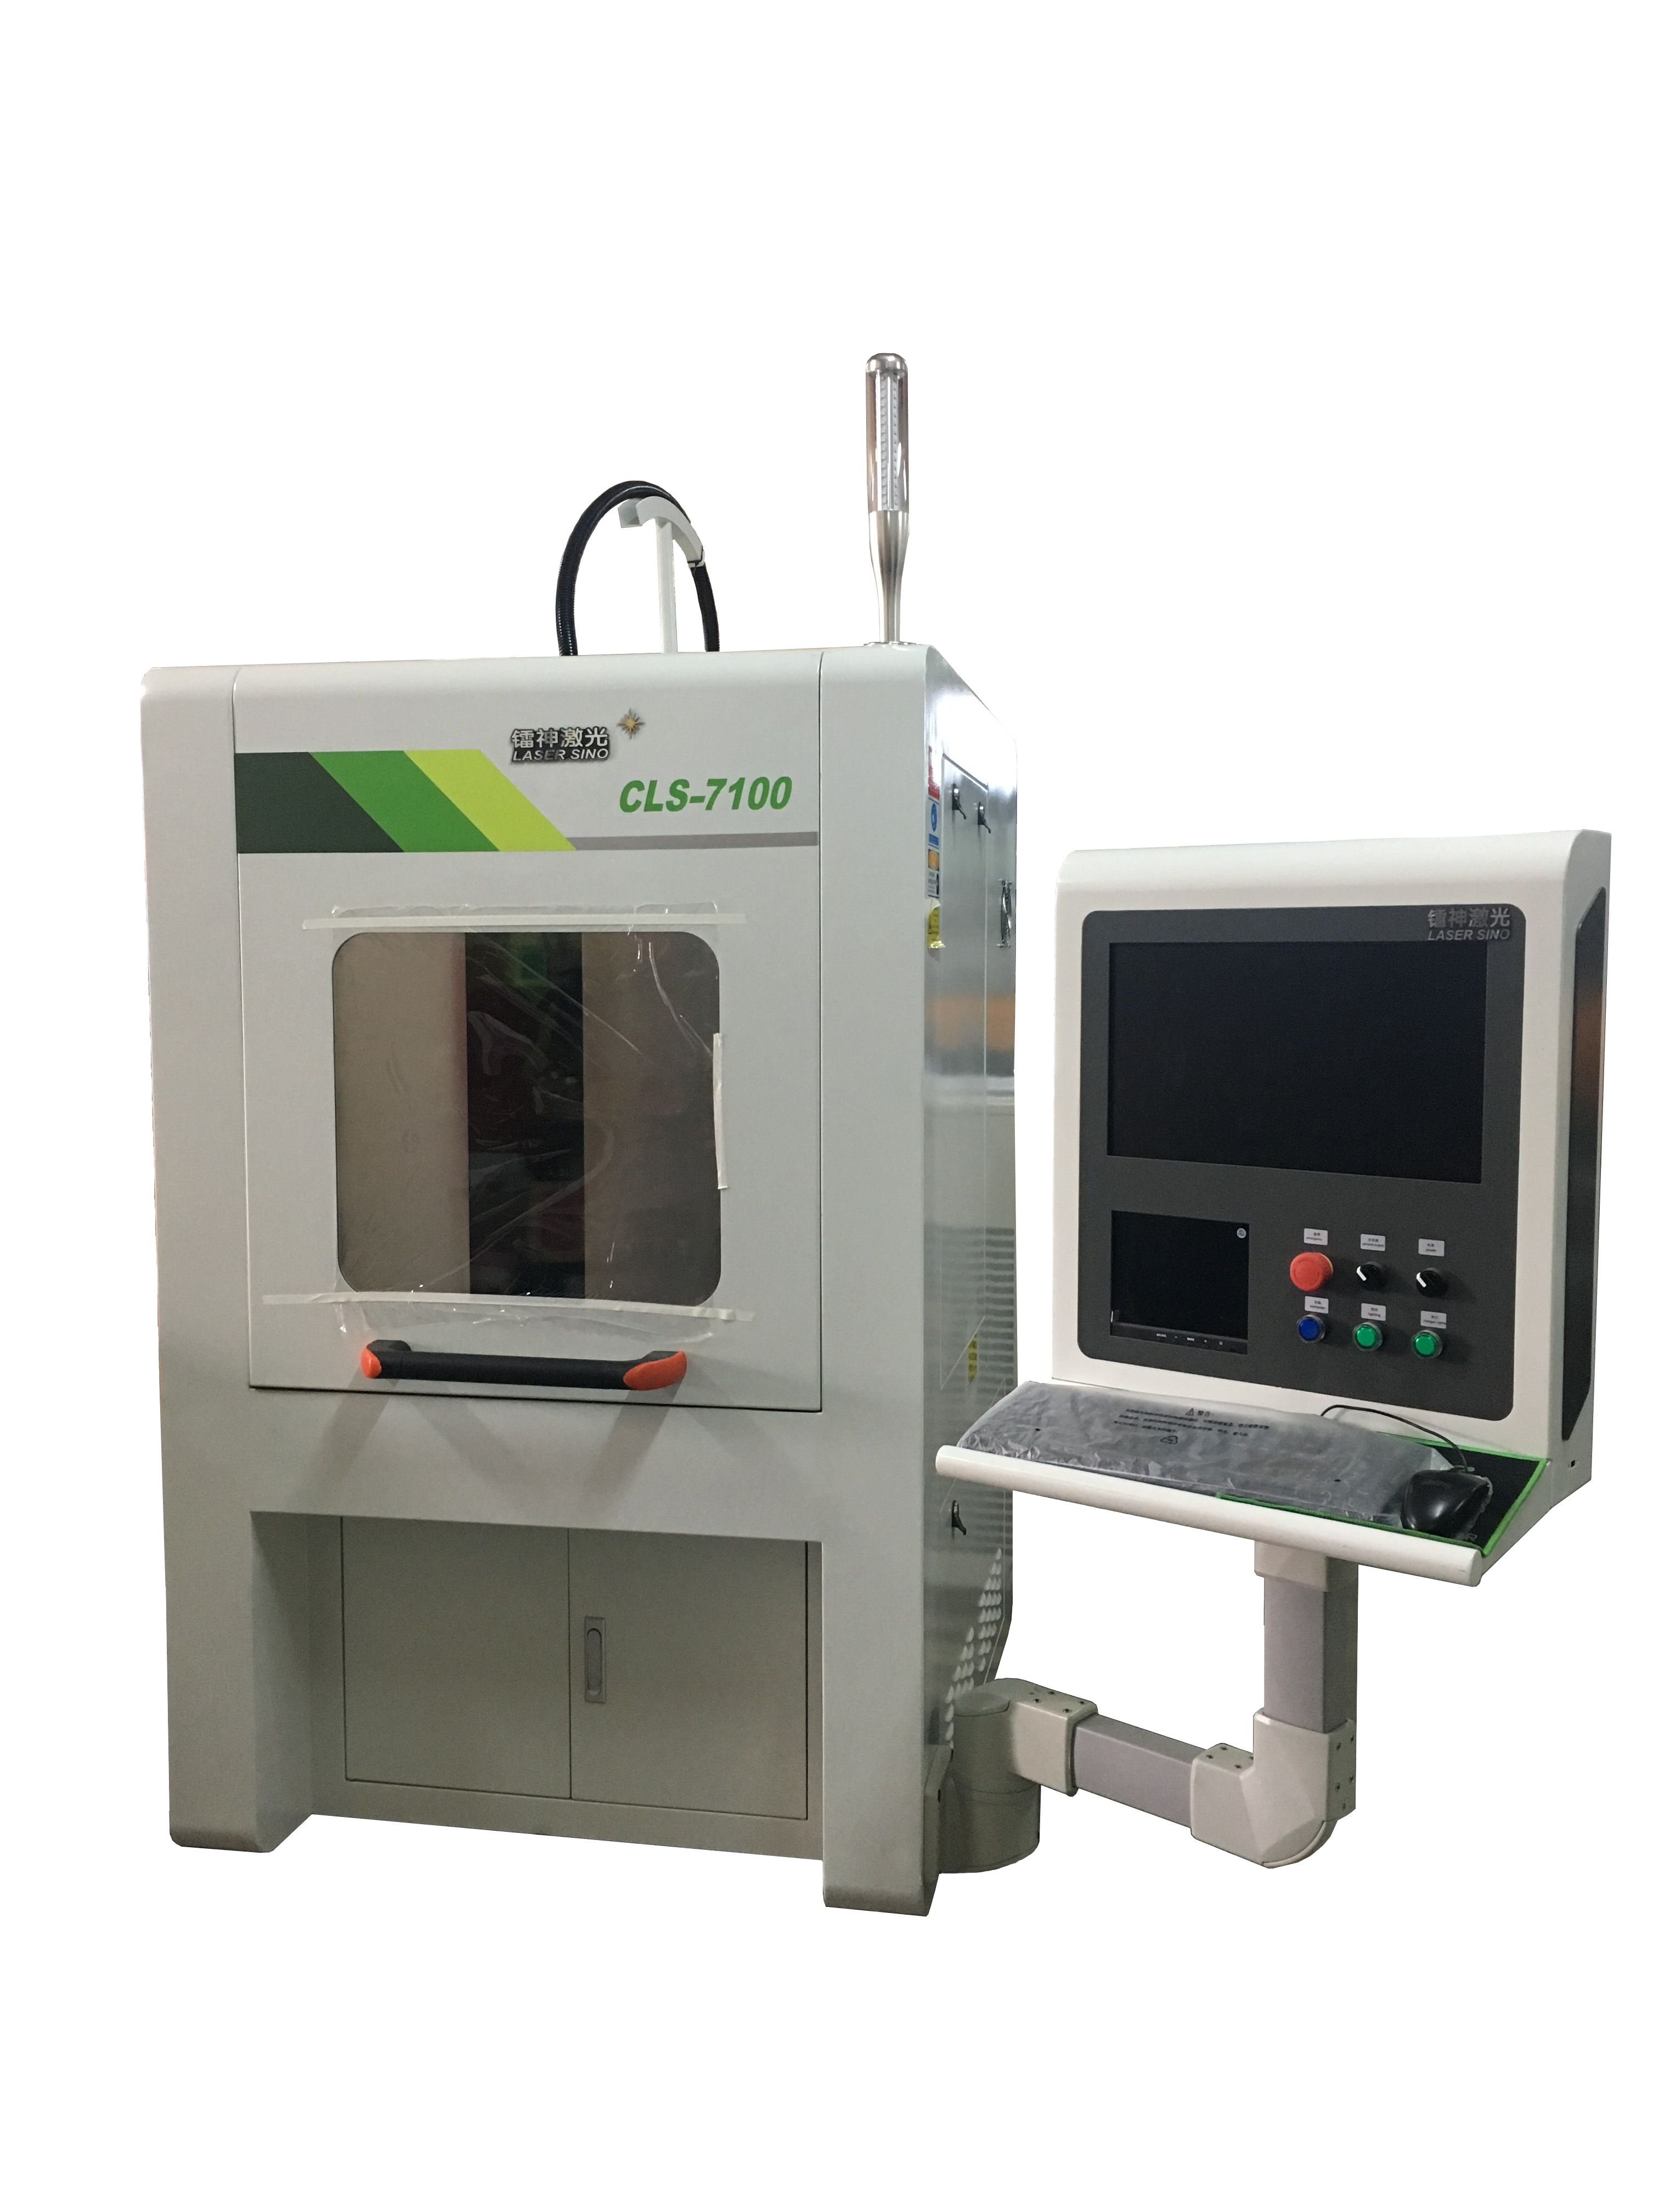 CLS7100高精度数控激光焊接机